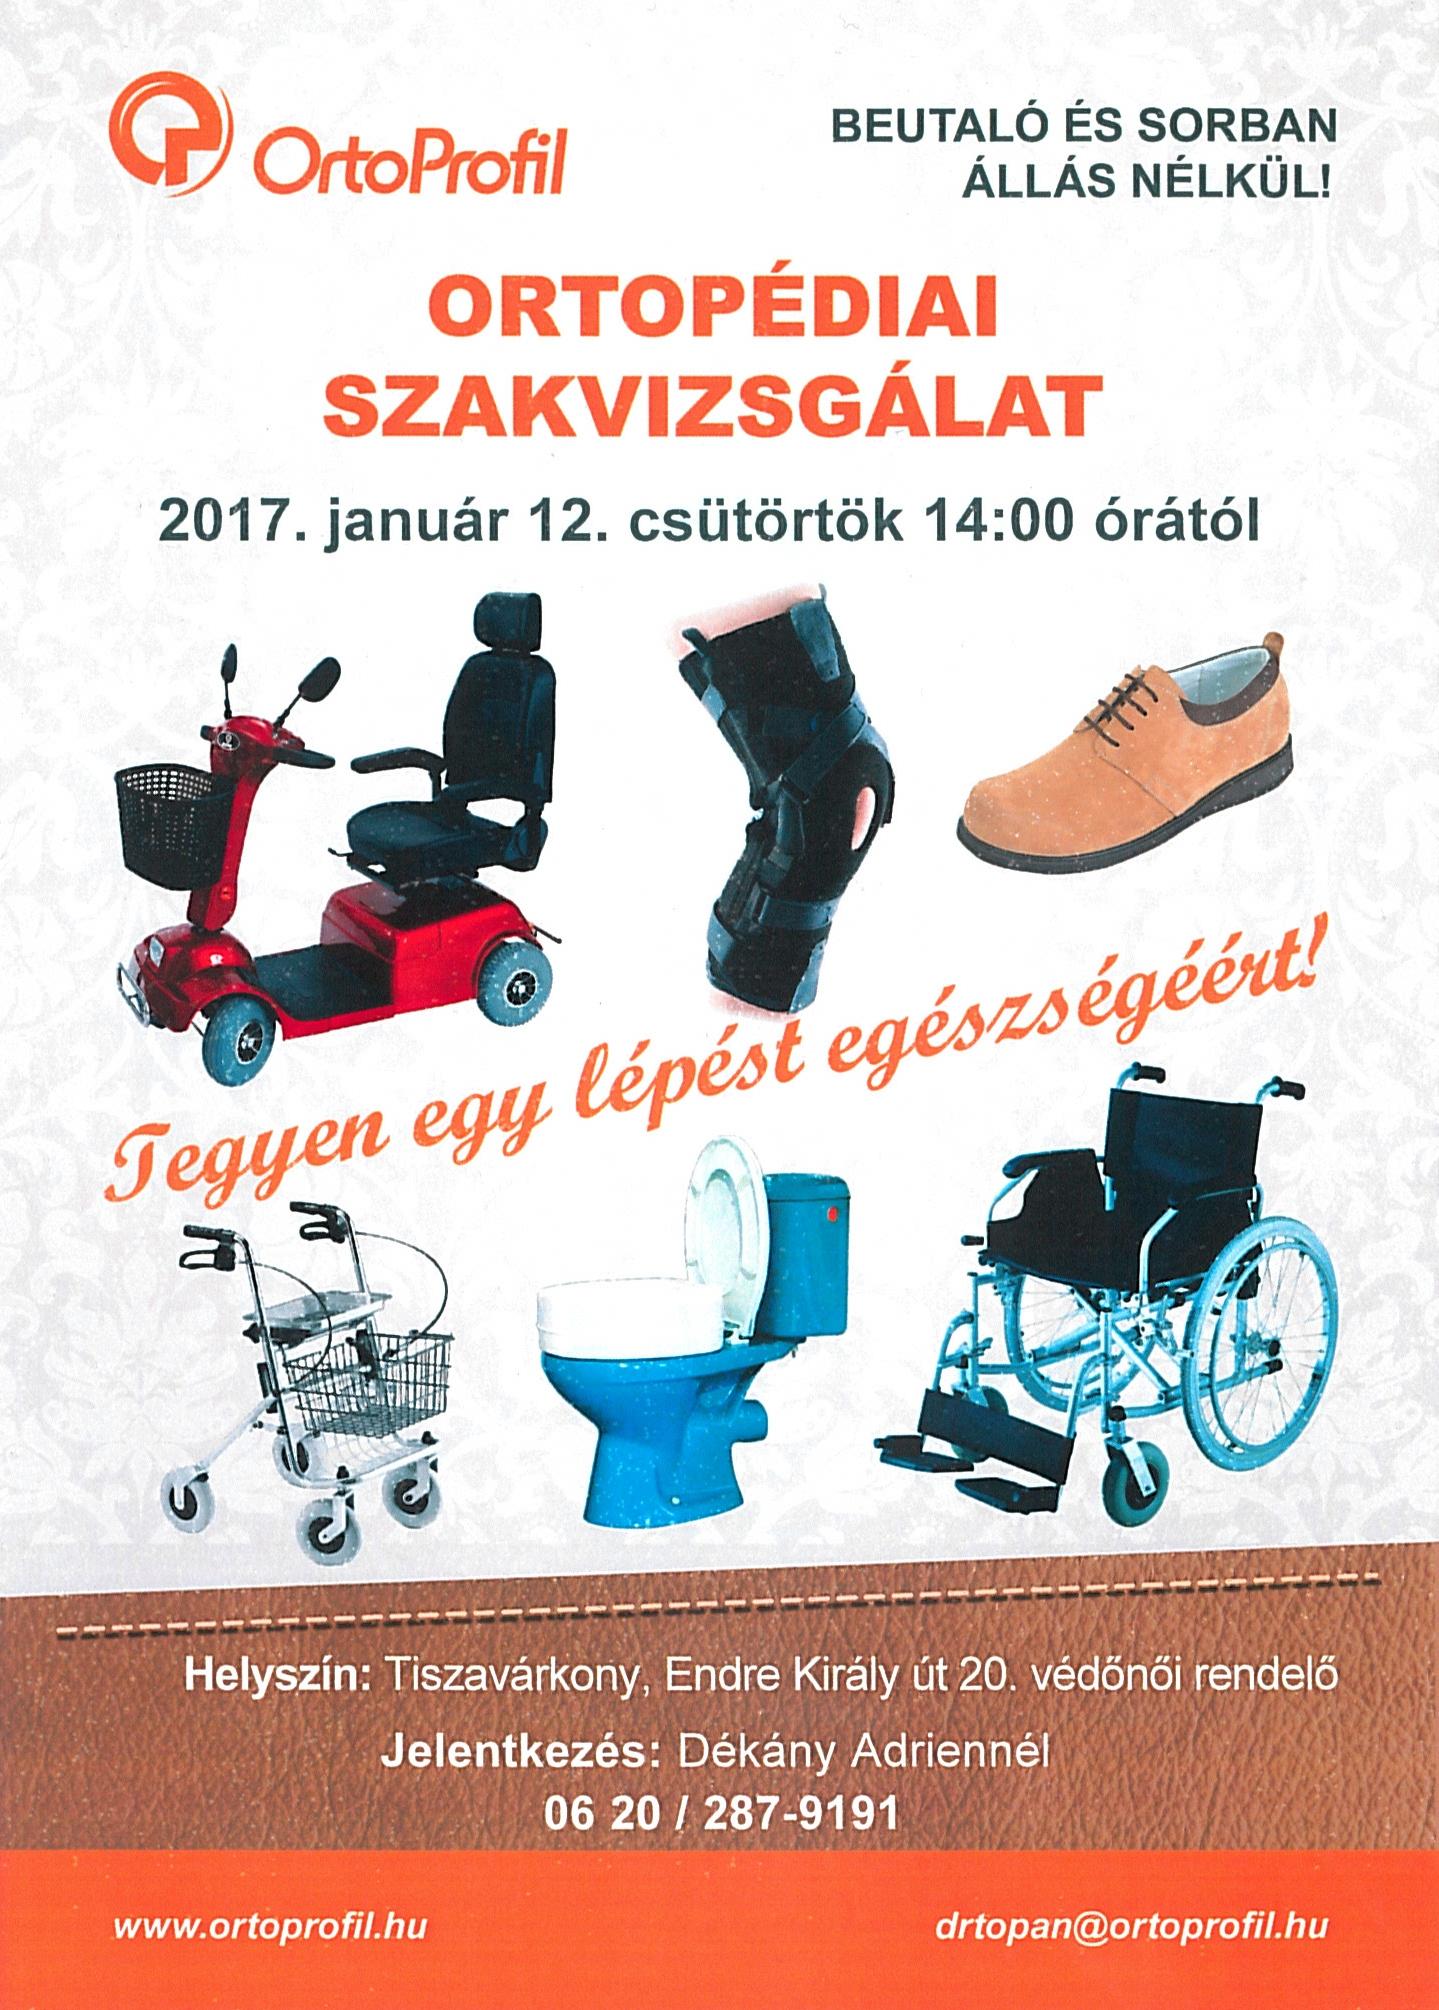 ortopediai_szakvizsgalat_2017_01_12